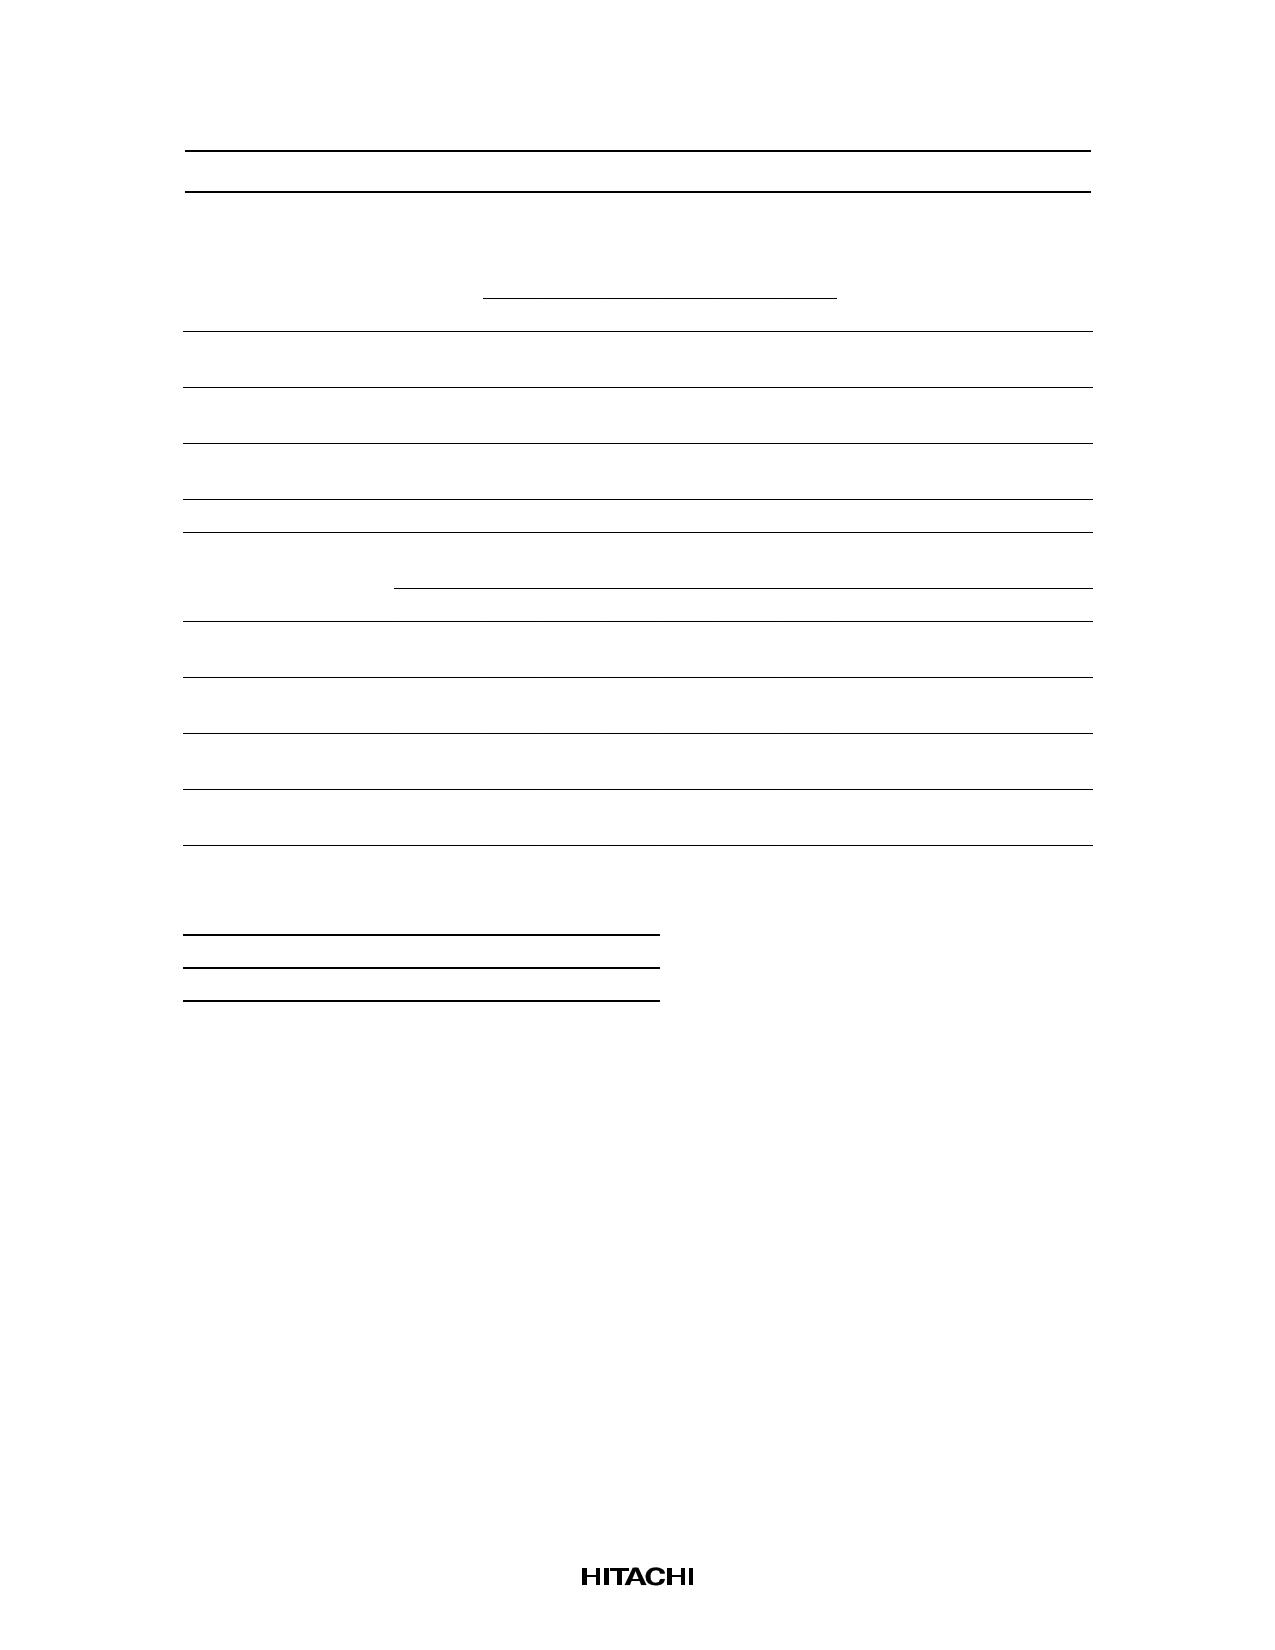 2SB648A pdf, schematic